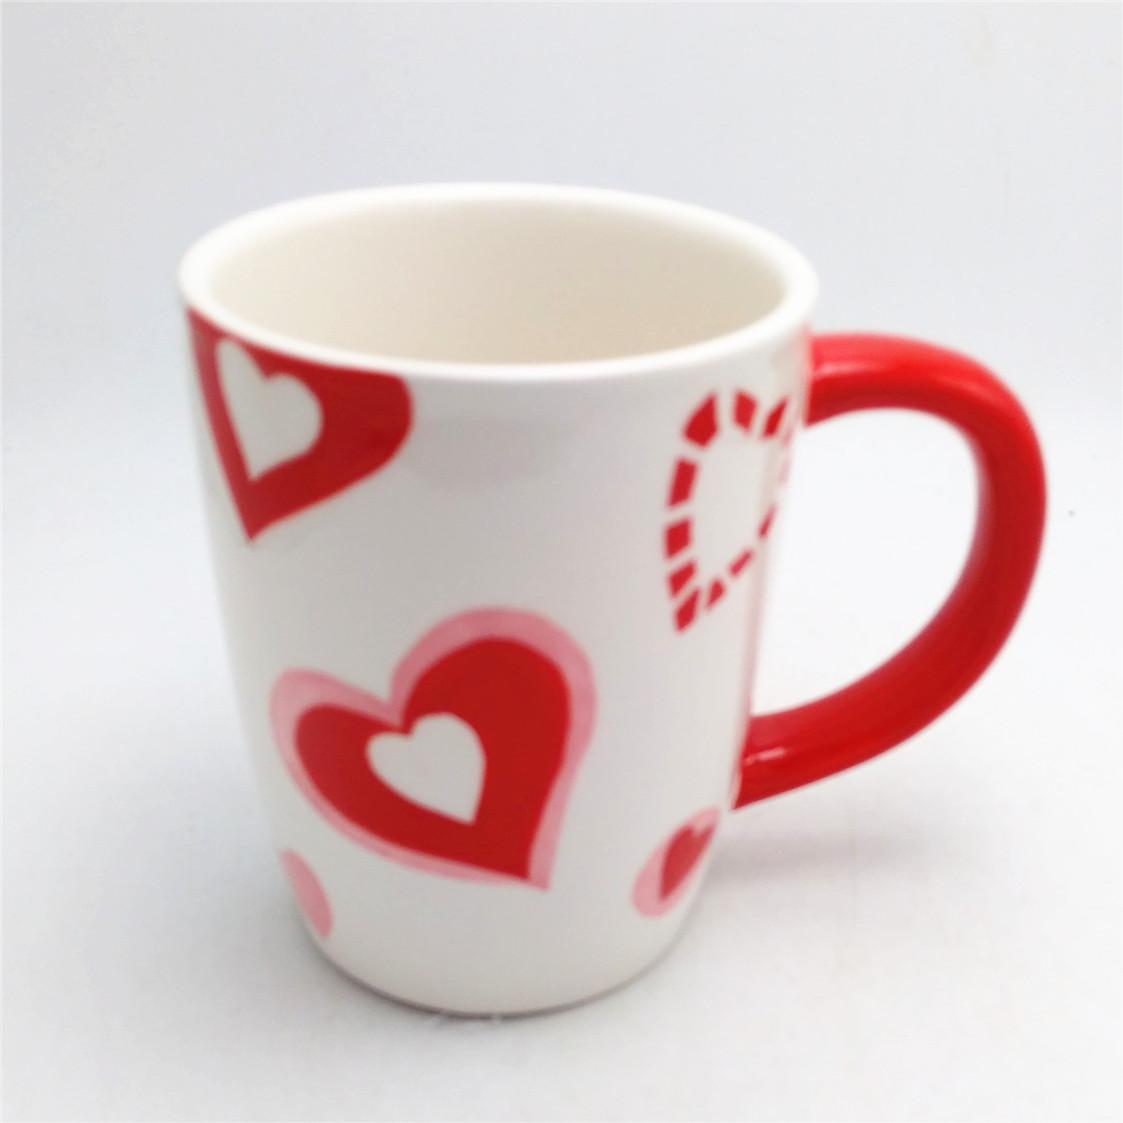 Customized ceramic pretty coffee mug  12 oz Valentine's coffee mugs